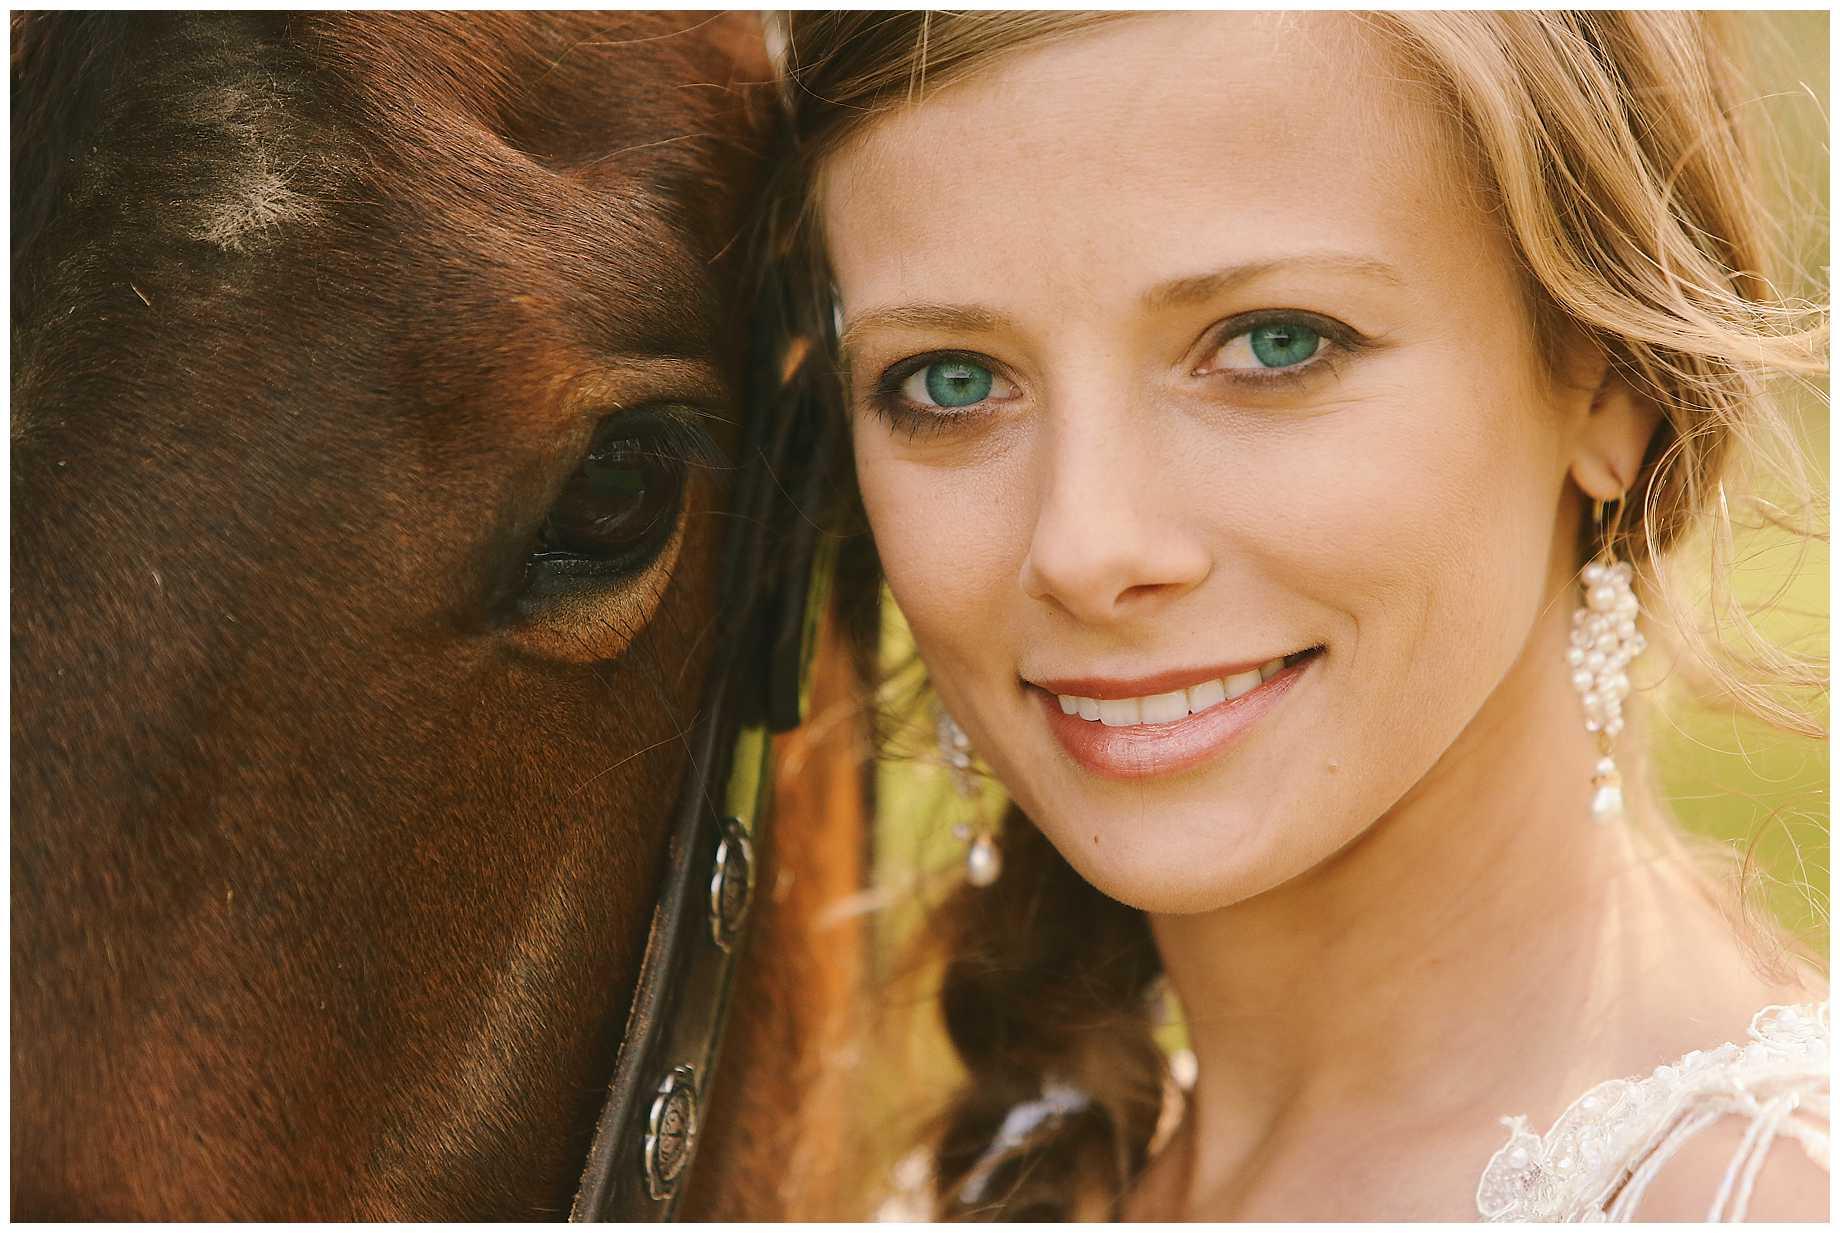 bride-on-a-horse-east-texas-07